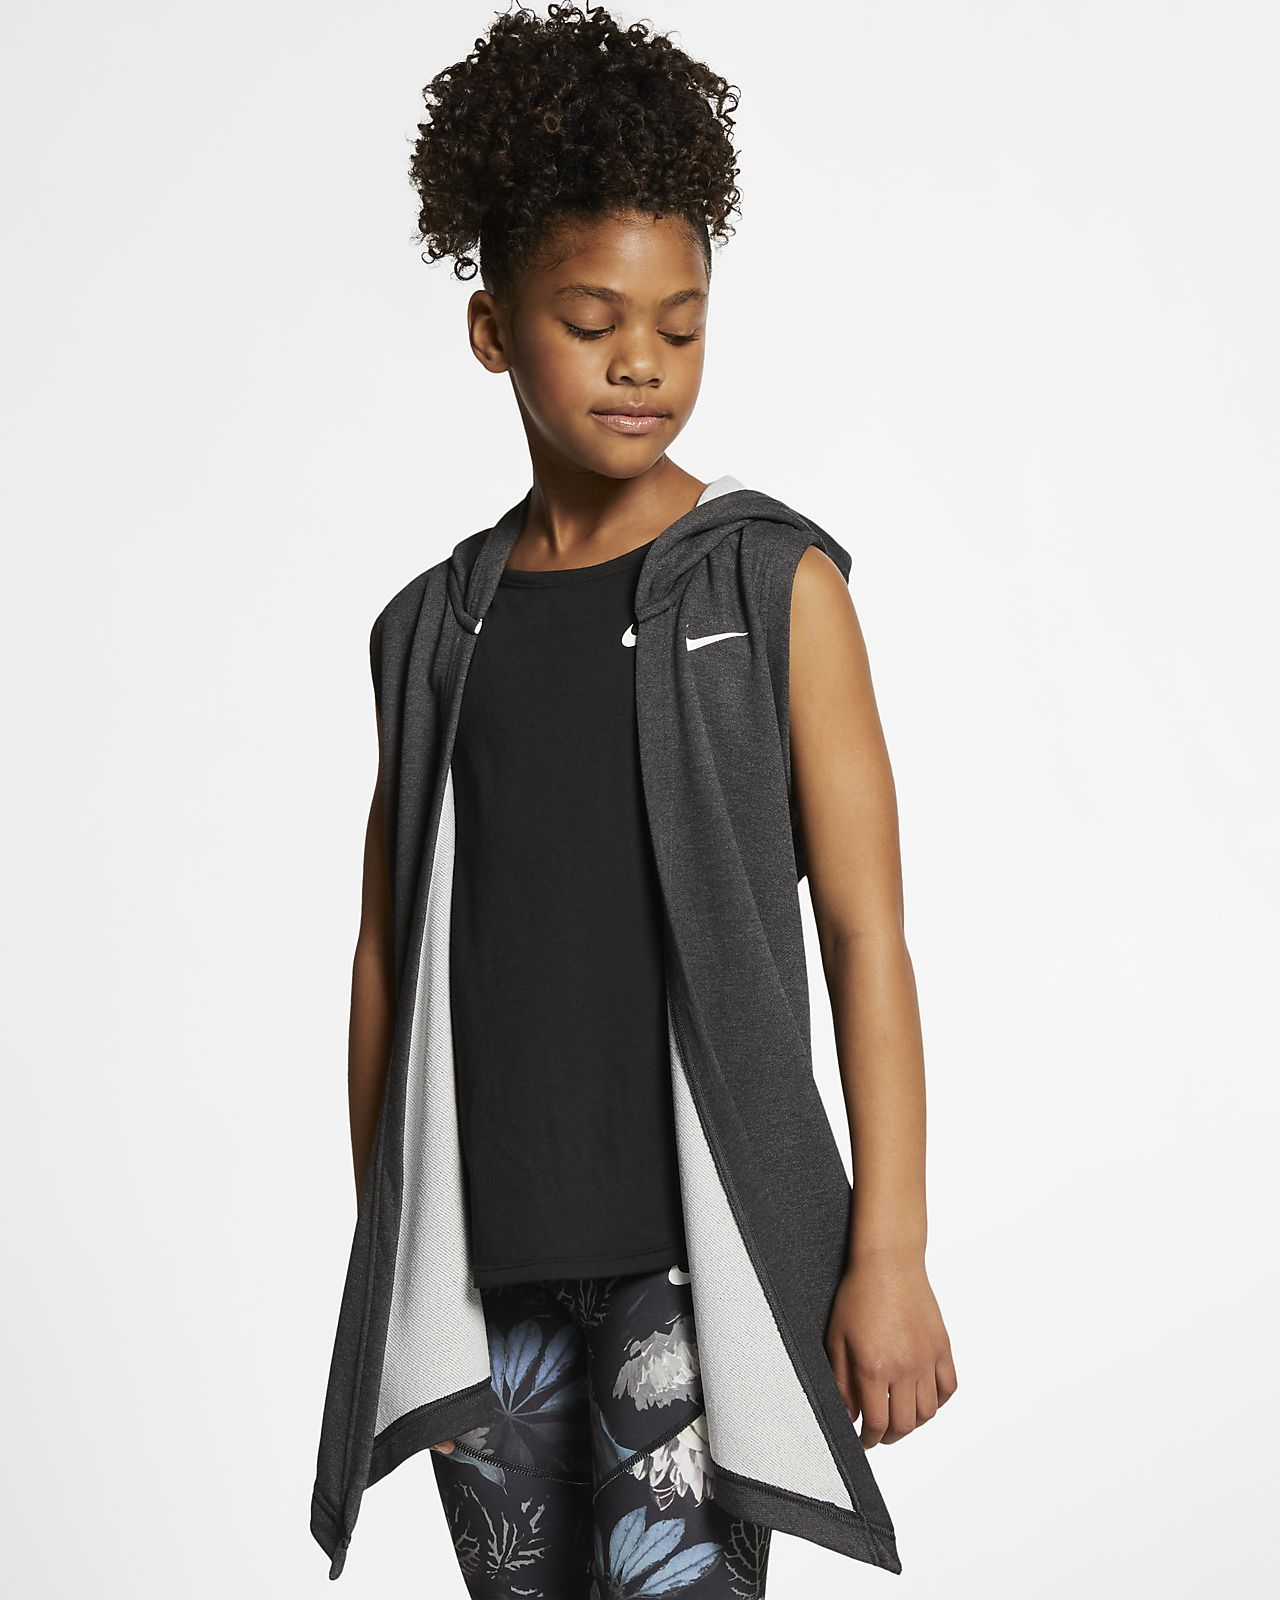 Nike Trainingsweste mit Kapuze für ältere Kinder (Mädchen)